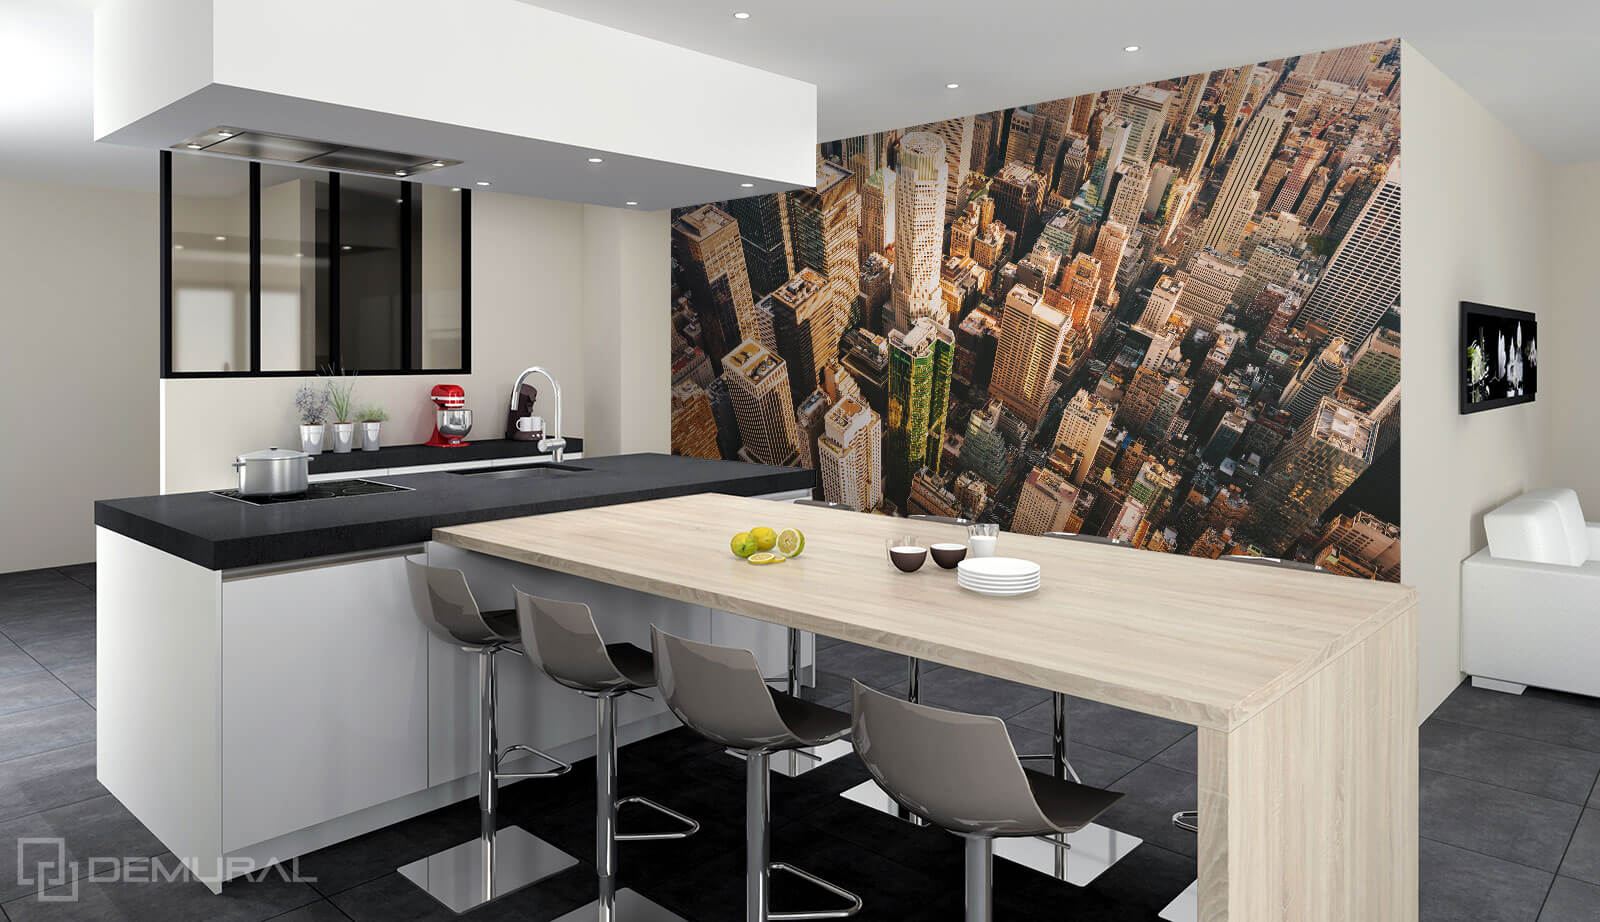 Photo wallpaper Scycrapers roofs - Photo wallpaper in big kitchen - Demural